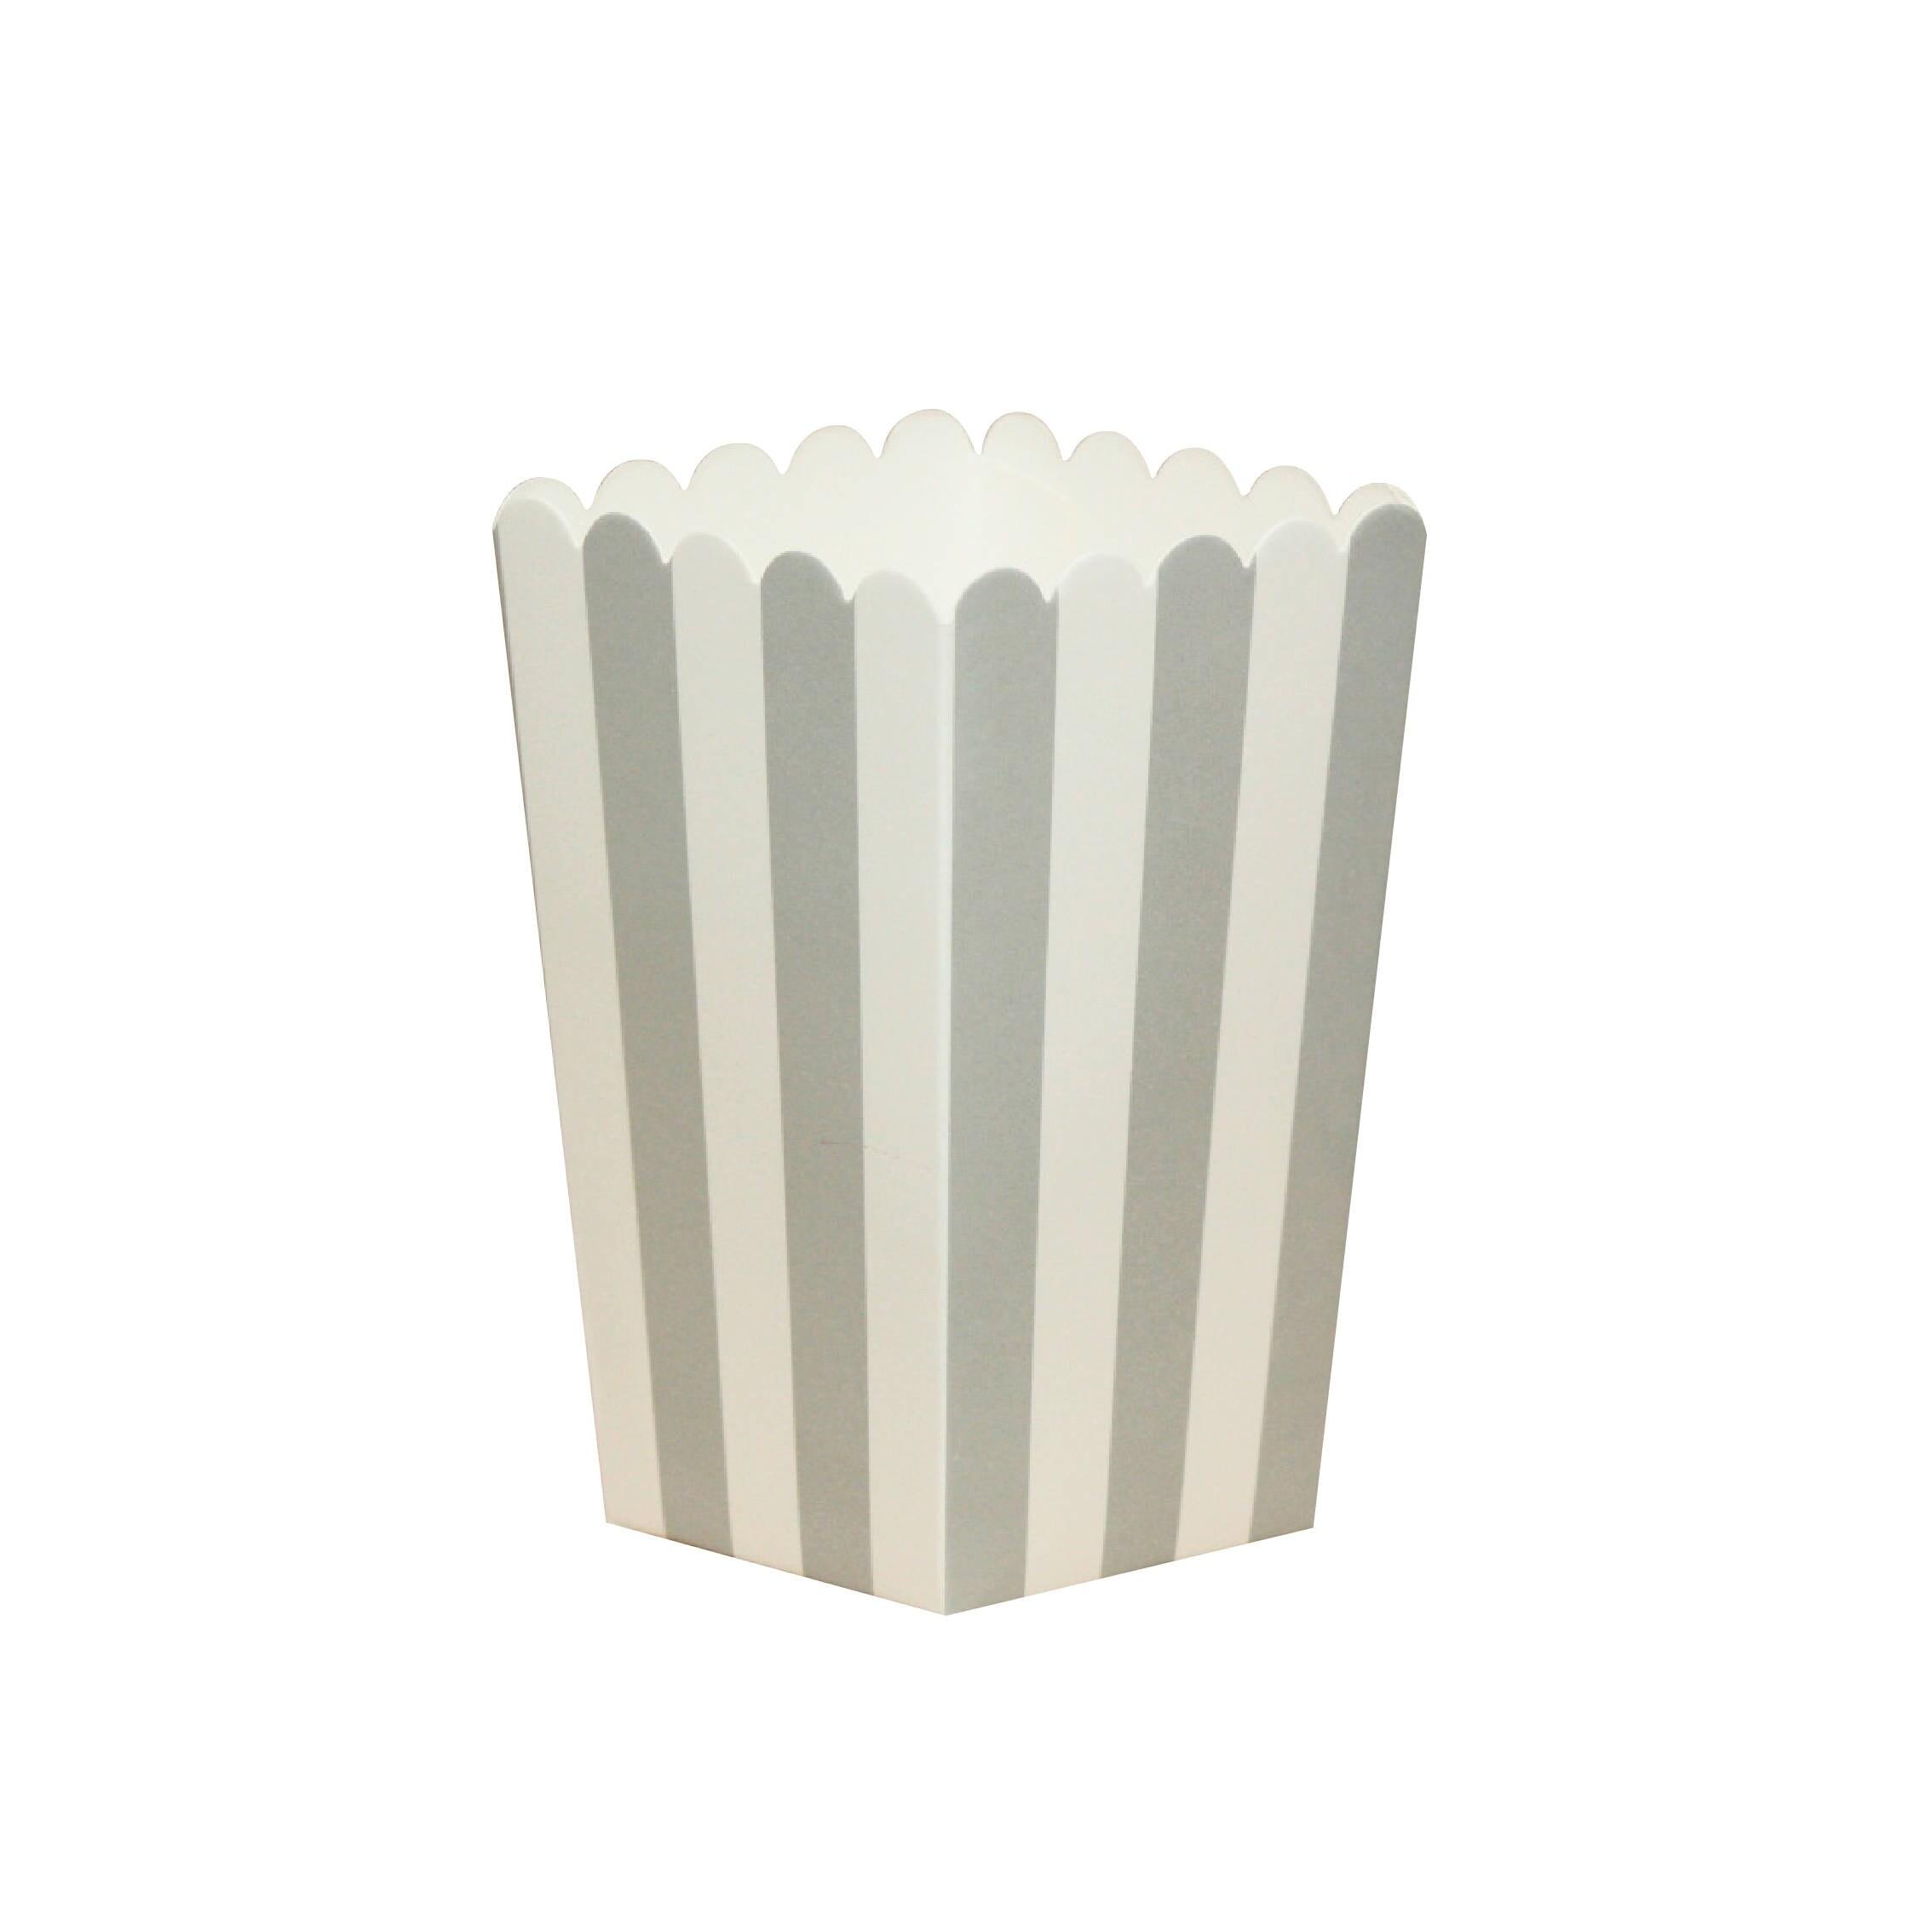 10 Grey Striped Popcorn Boxes Grey Striped Popcorn Scoop Gray ...